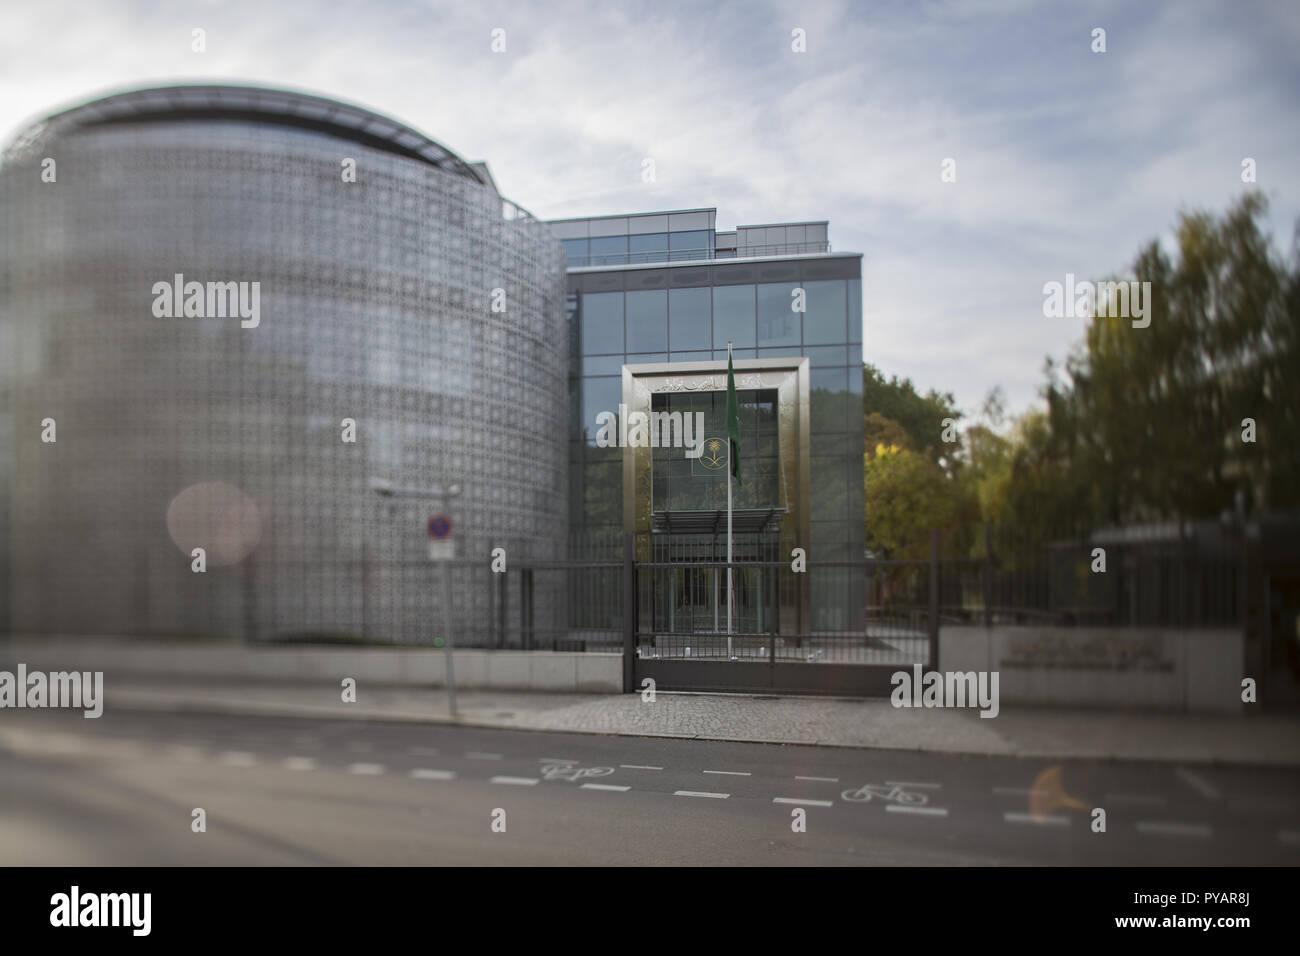 09.10.2018, Berlin: Blick auf die Botschaft des Königreichs Saudi-Arabien a Berlino. (Aufahme mit Tilt-Shift Objekiv) Foto: Wolfram Kastl/dpa | Utilizzo di tutto il mondo Immagini Stock